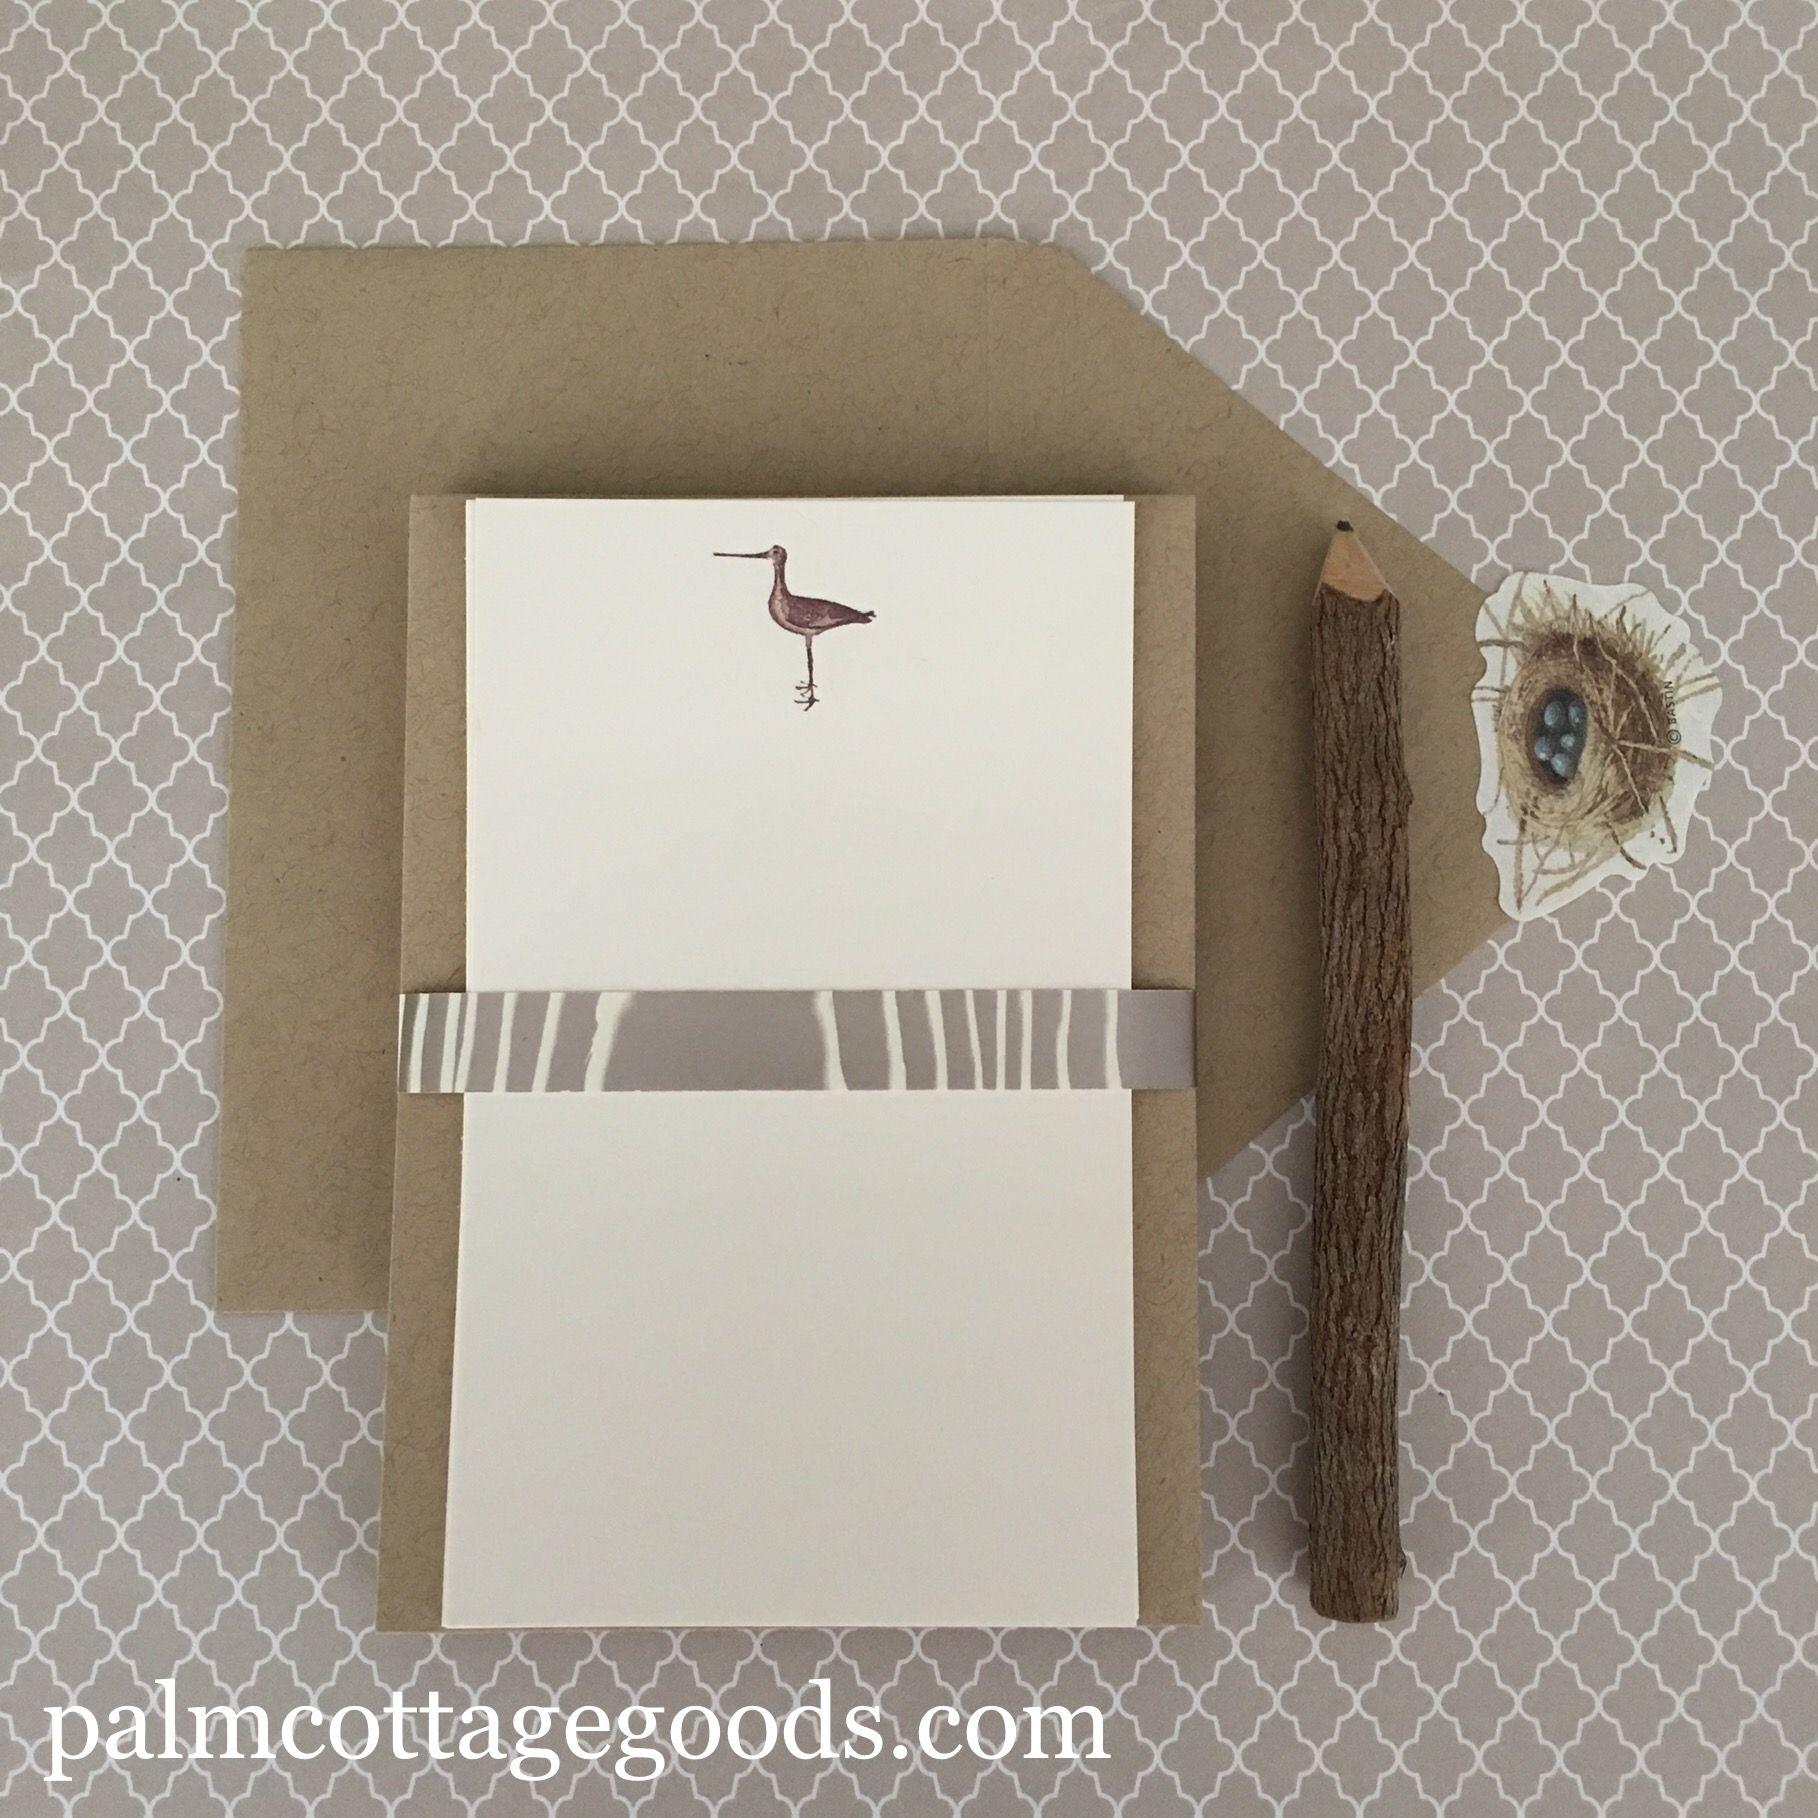 Sandpaper Tiny Notecards & Envelopes. Betty